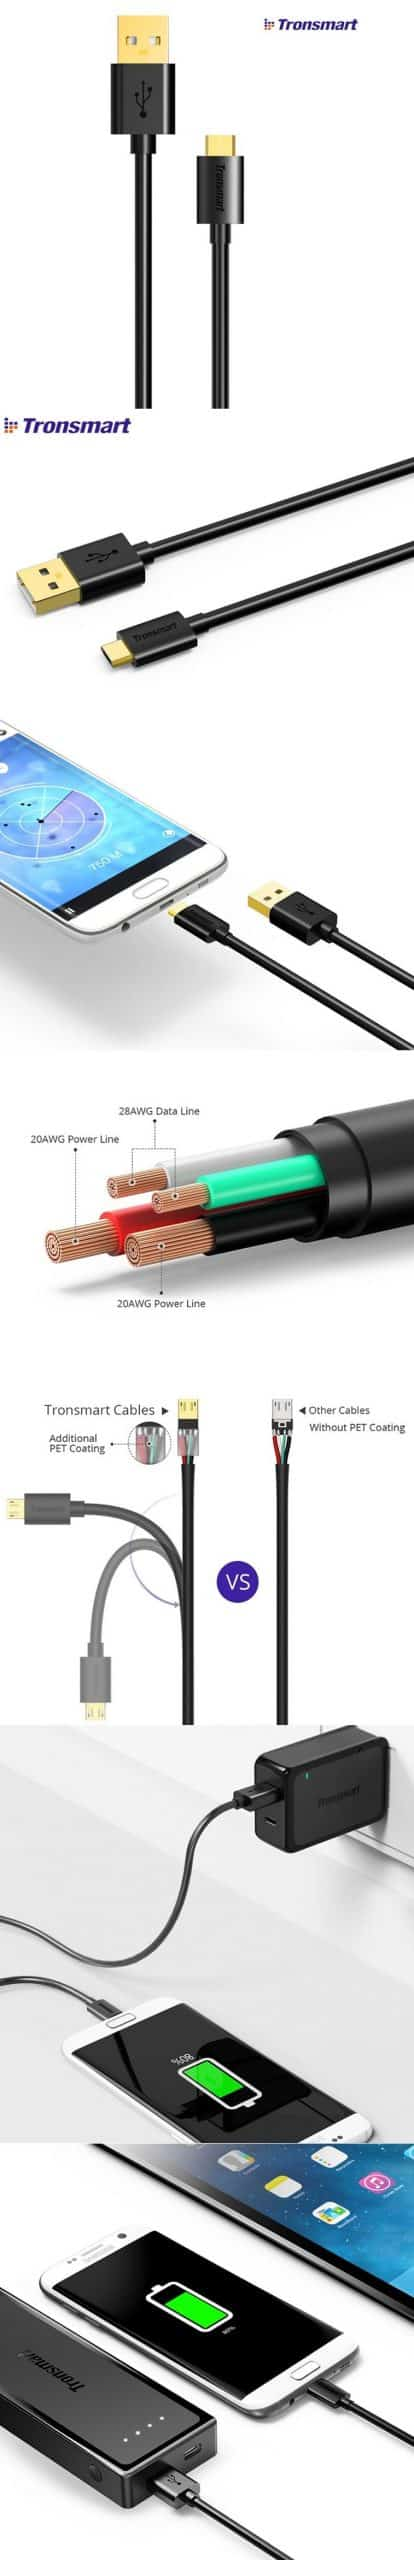 TRONSMART MTA42 Micro USB Cable Premium Cable 1